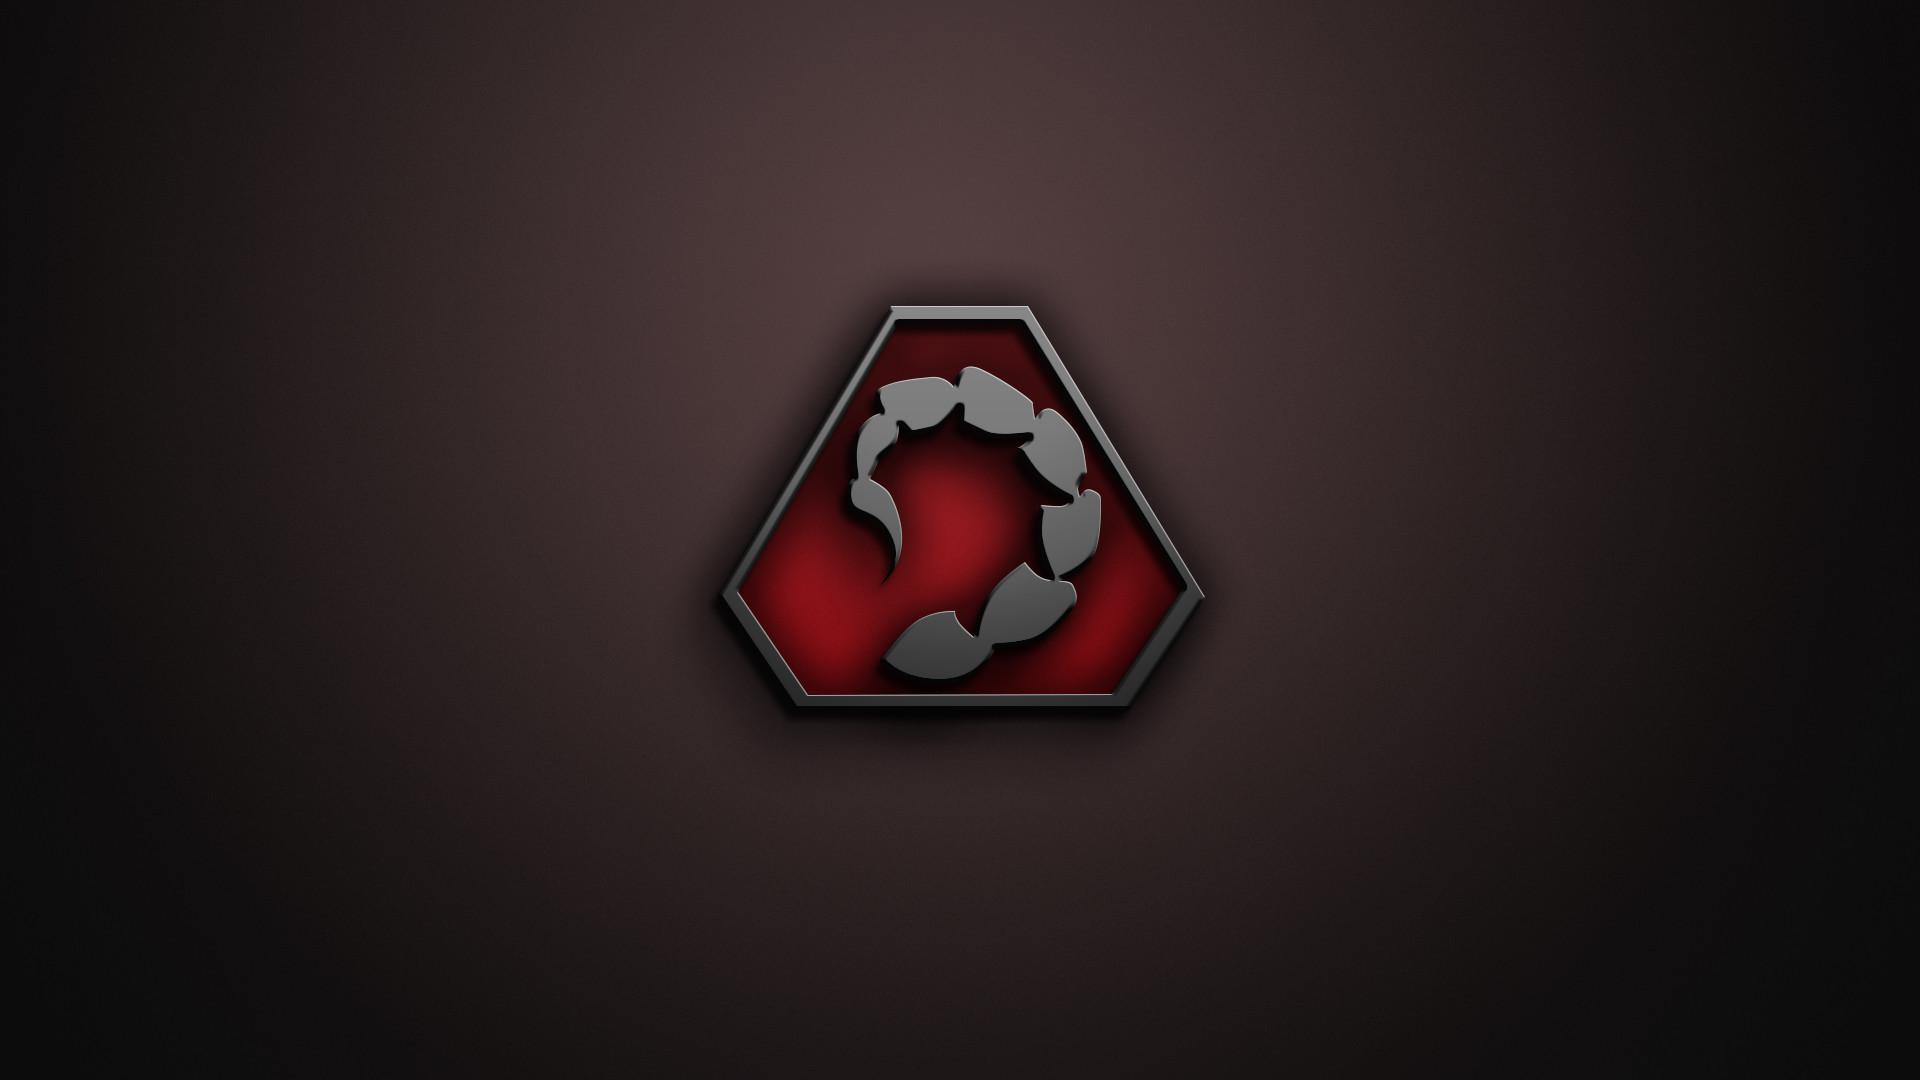 Res: 1920x1080, ... Deus Ex, Dust514, Earthbound, Eve Online, Eve Online Guristas, Eve  Online Blood Raiders, Fallout Vault-Tec, Grand Theft Auto V, Half Life  black mesa, ...